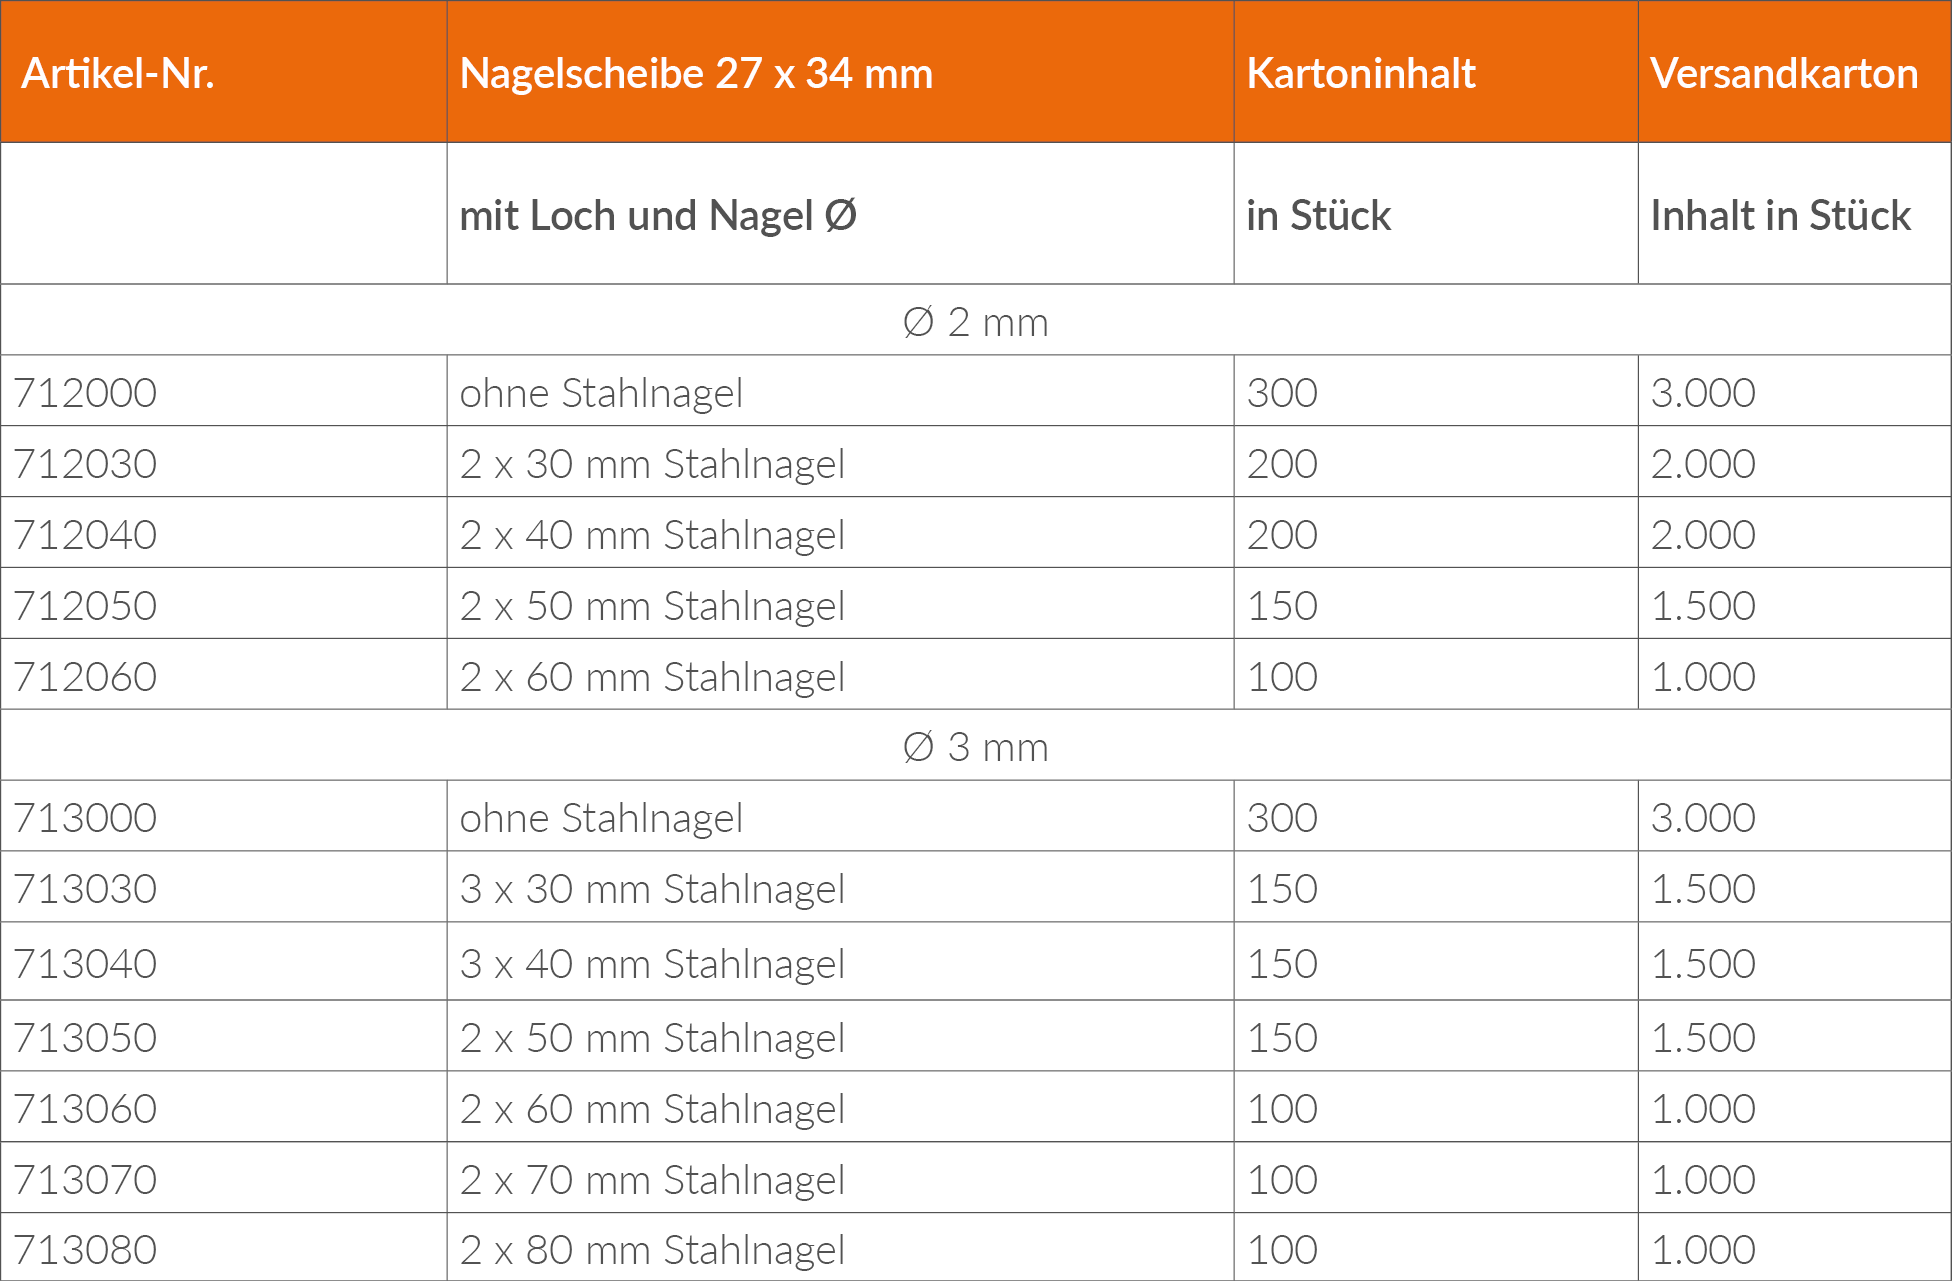 Nagelscheibe_Lieferprogramm